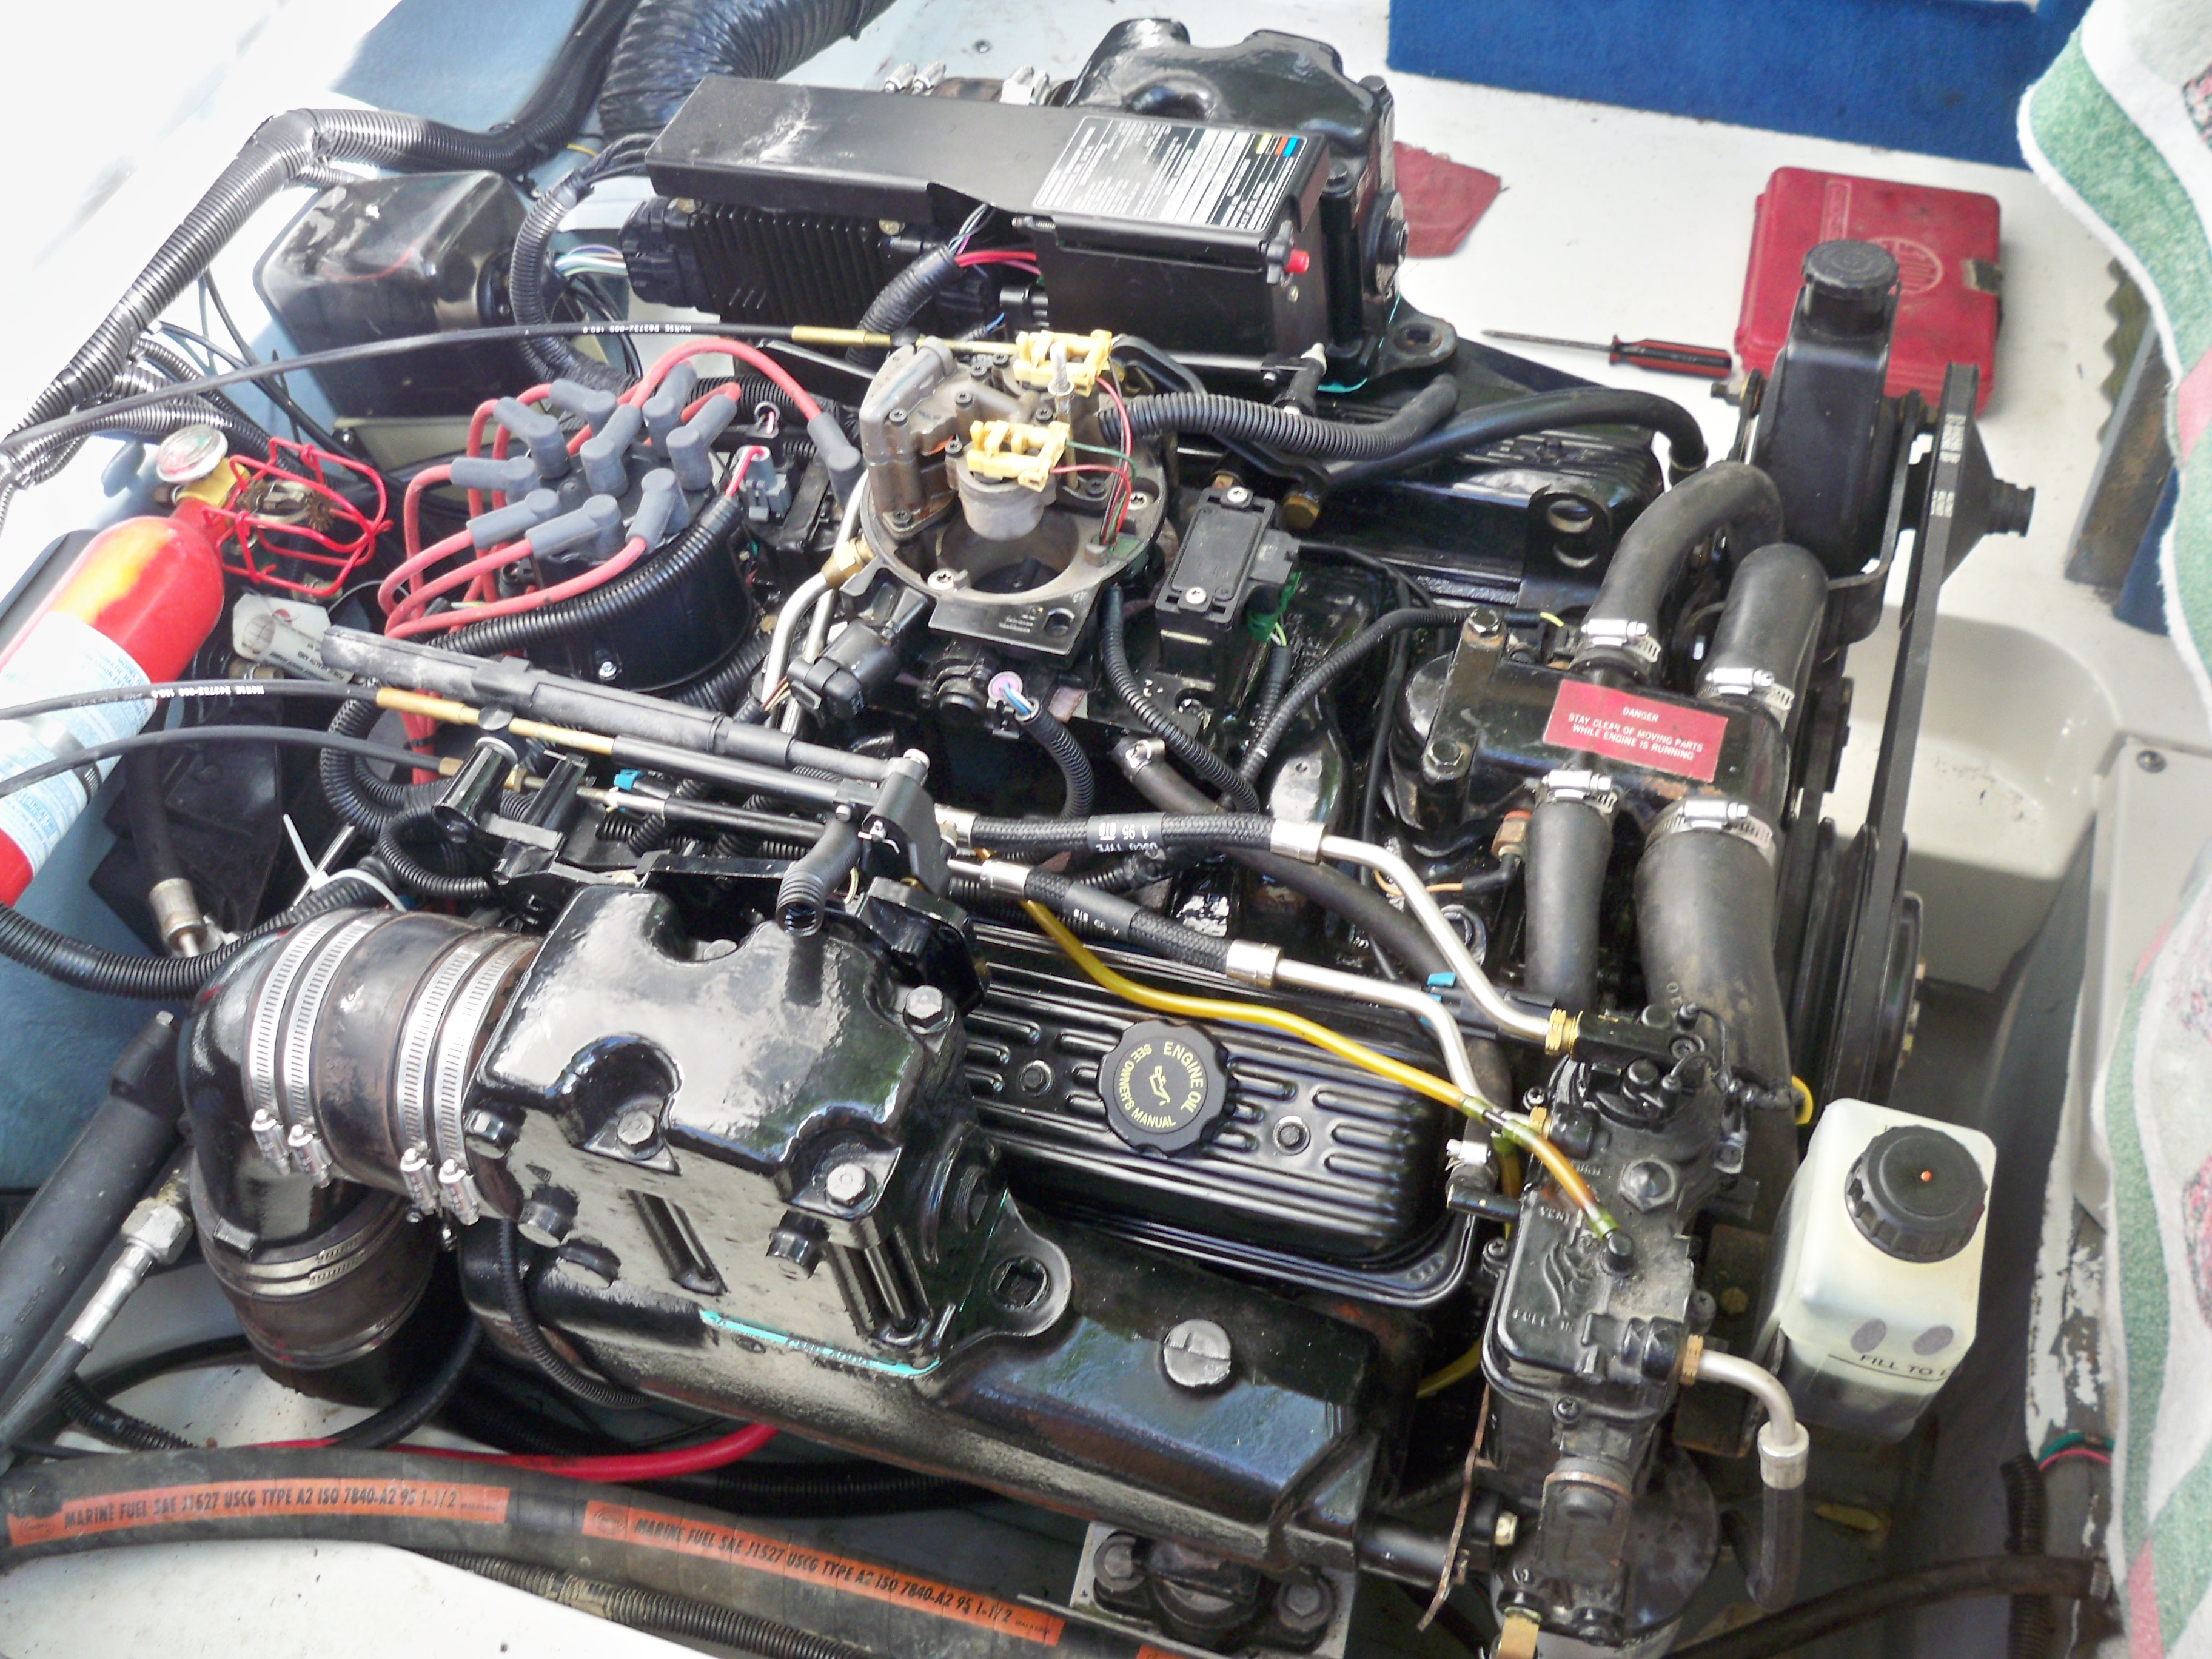 Please help. I had to rebuild my 1996 5.7LX EFI Mercruiser ...